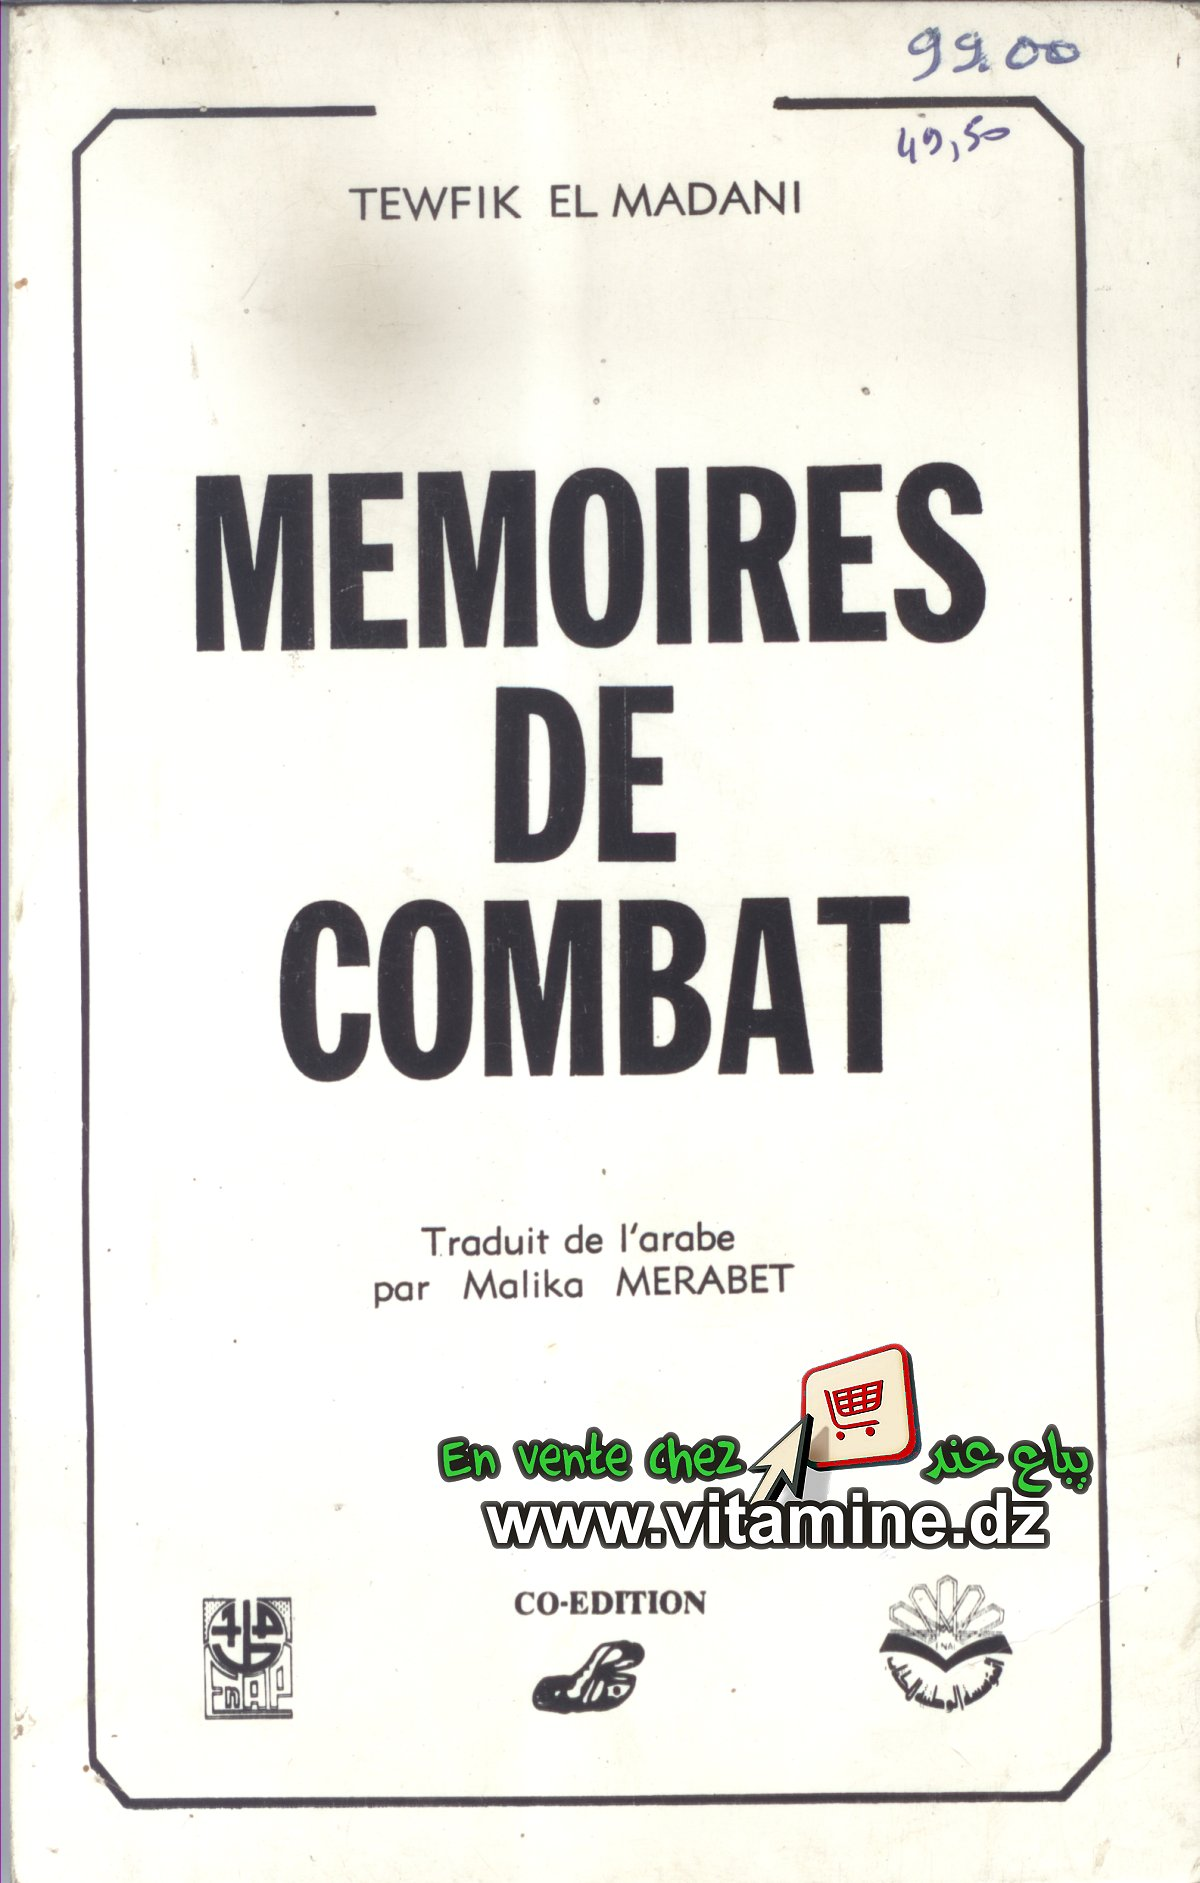 Tewfik El Madani - Mémoires de combat